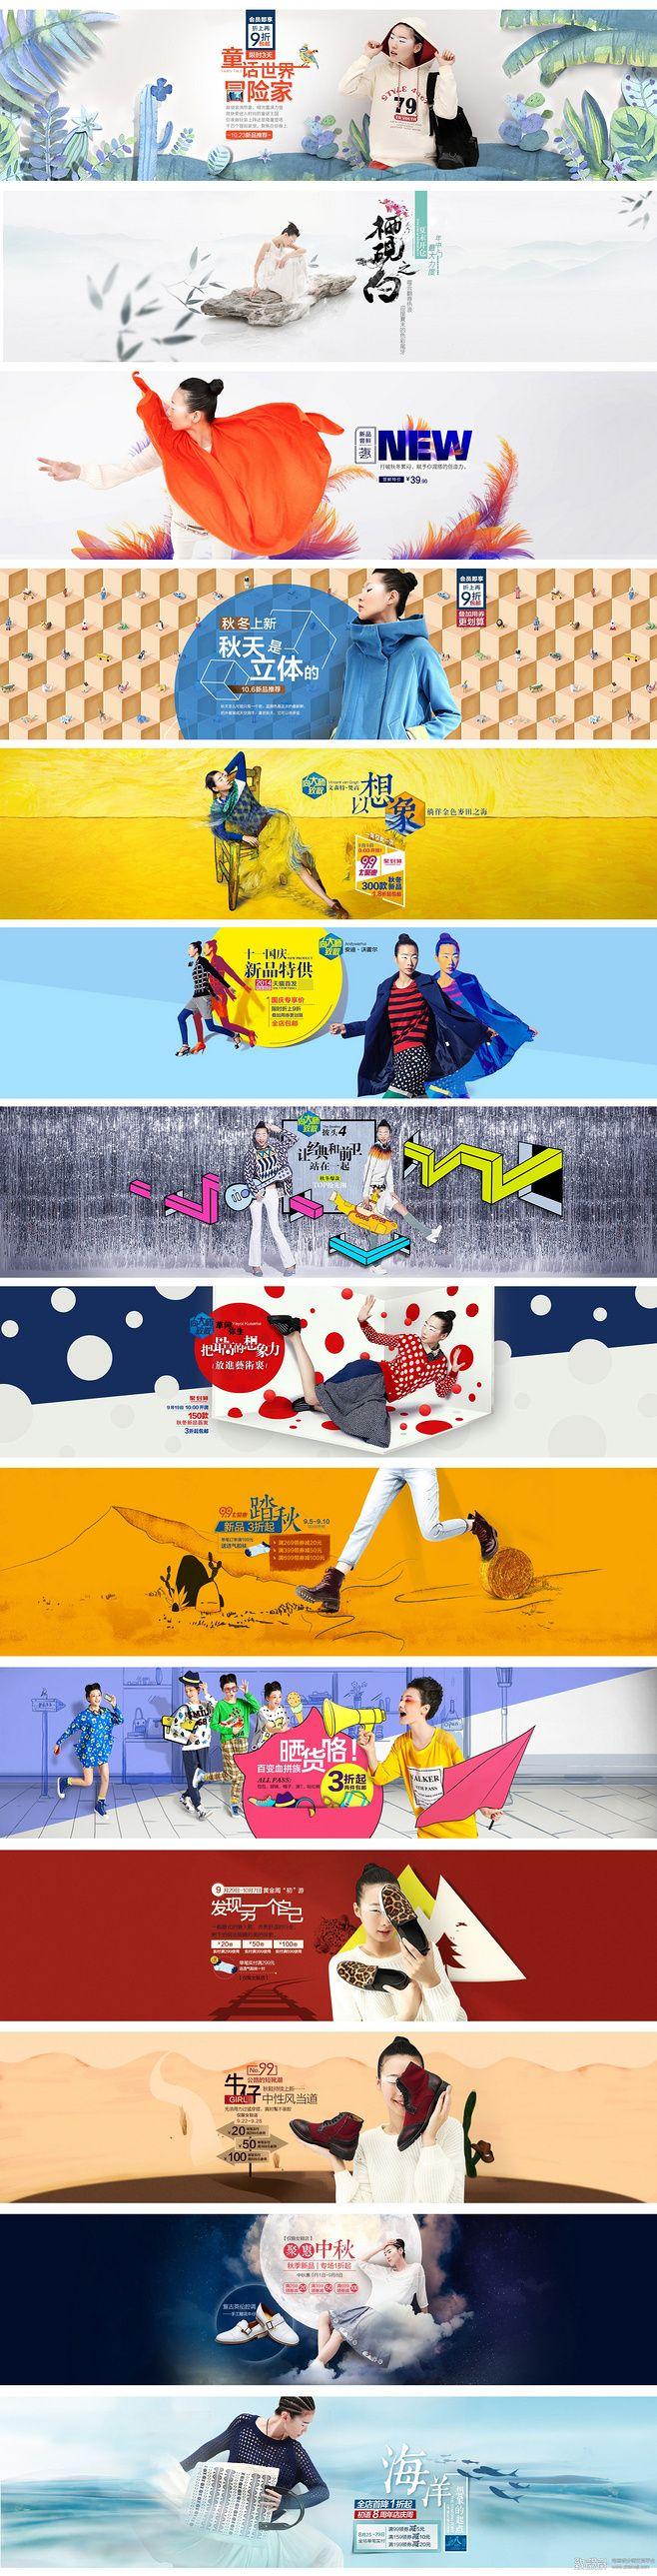 322 best Banner images on Pinterest   Advertising, Birthday cards ...